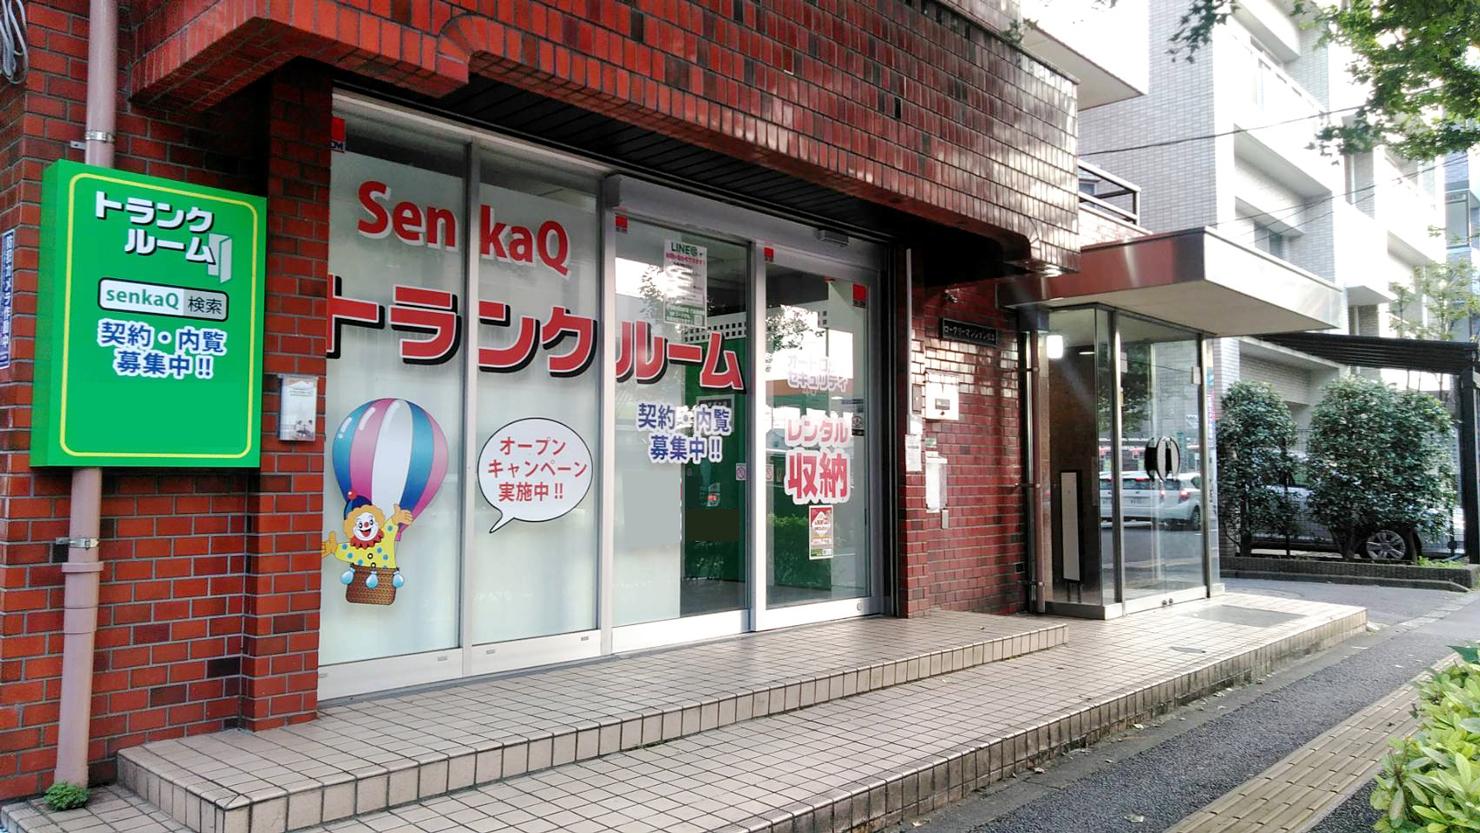 SenkaQトランクルーム井草店